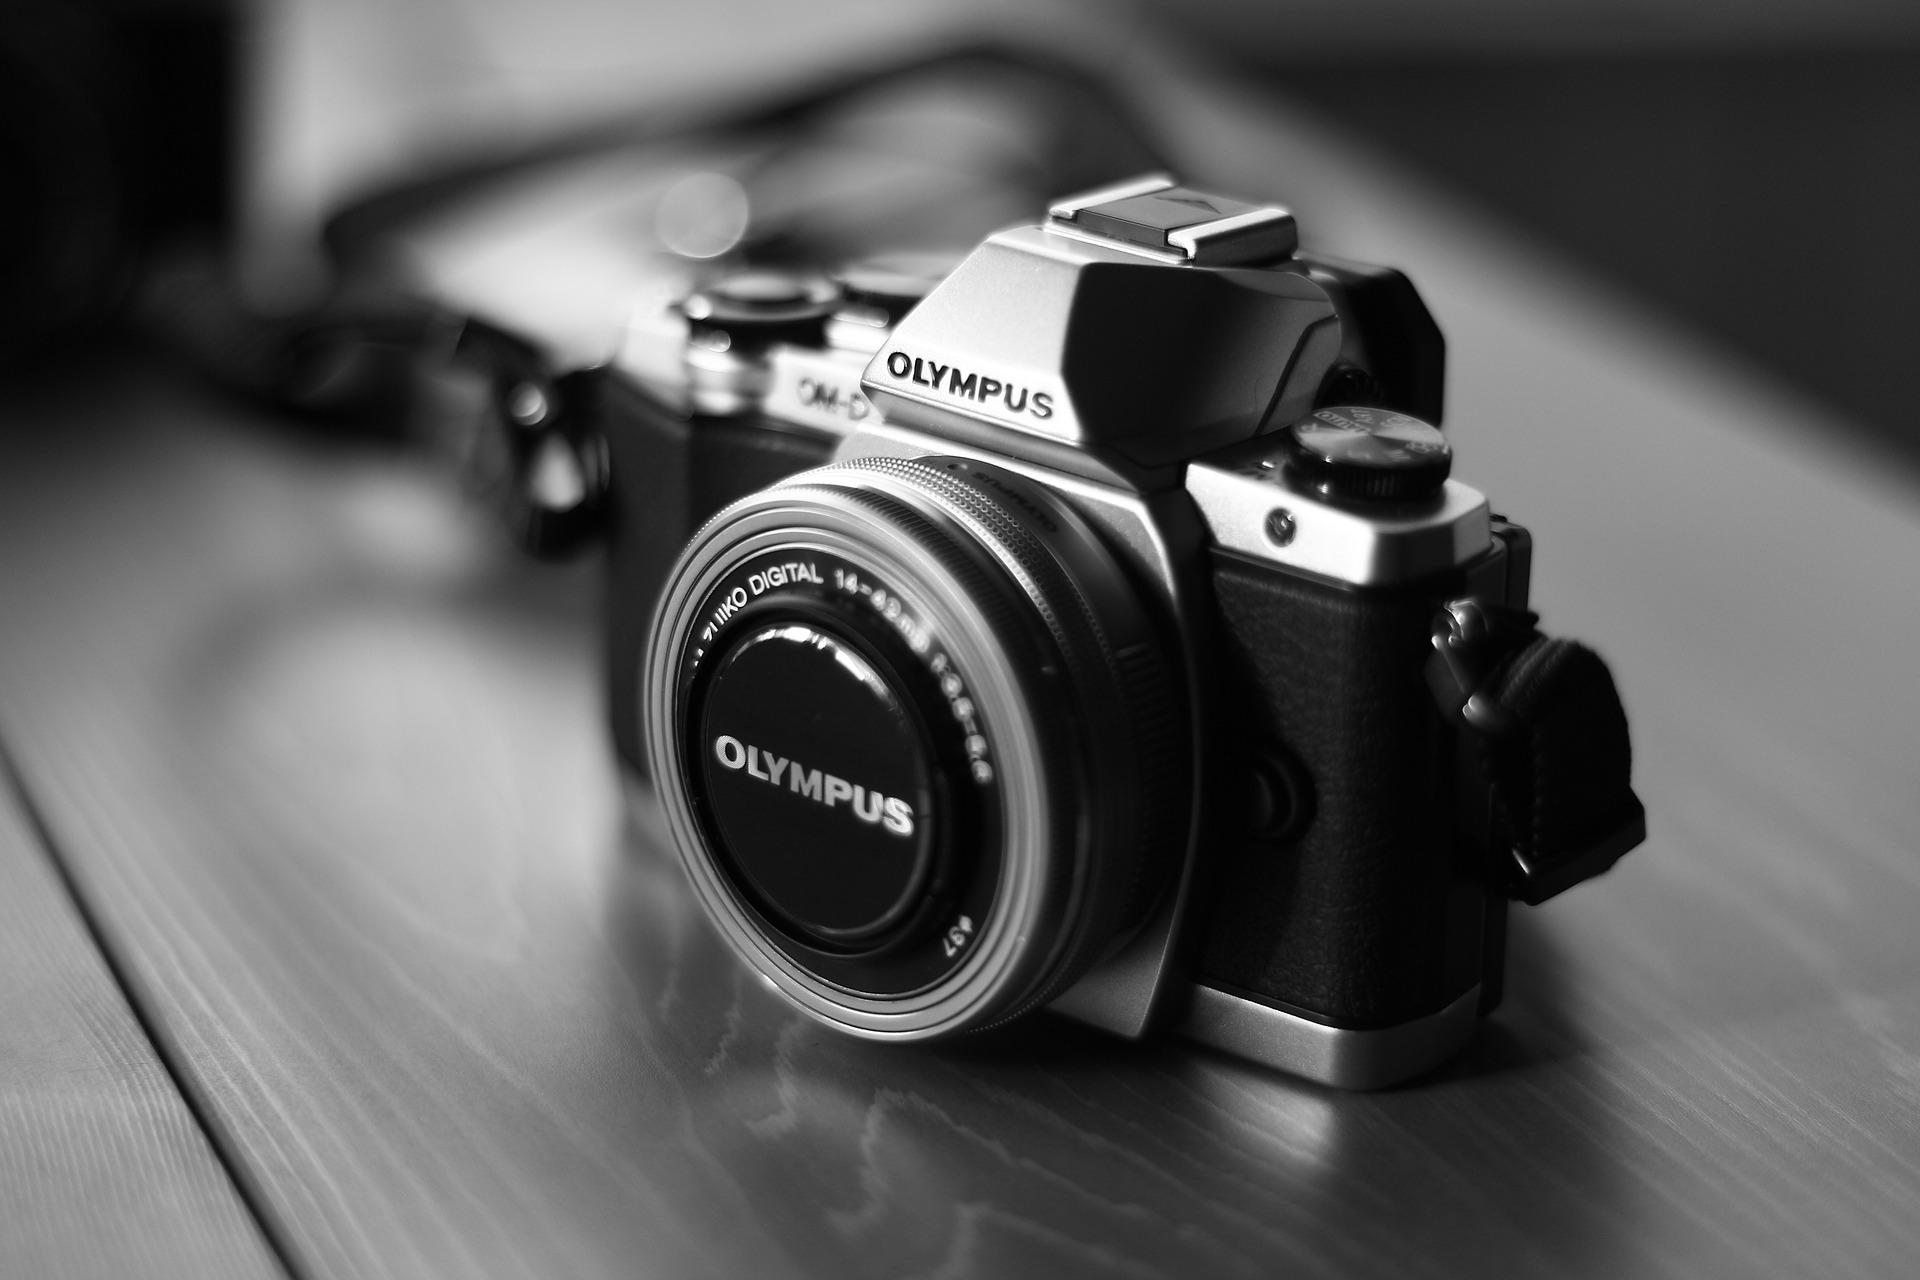 camera-541213_1920 (2)